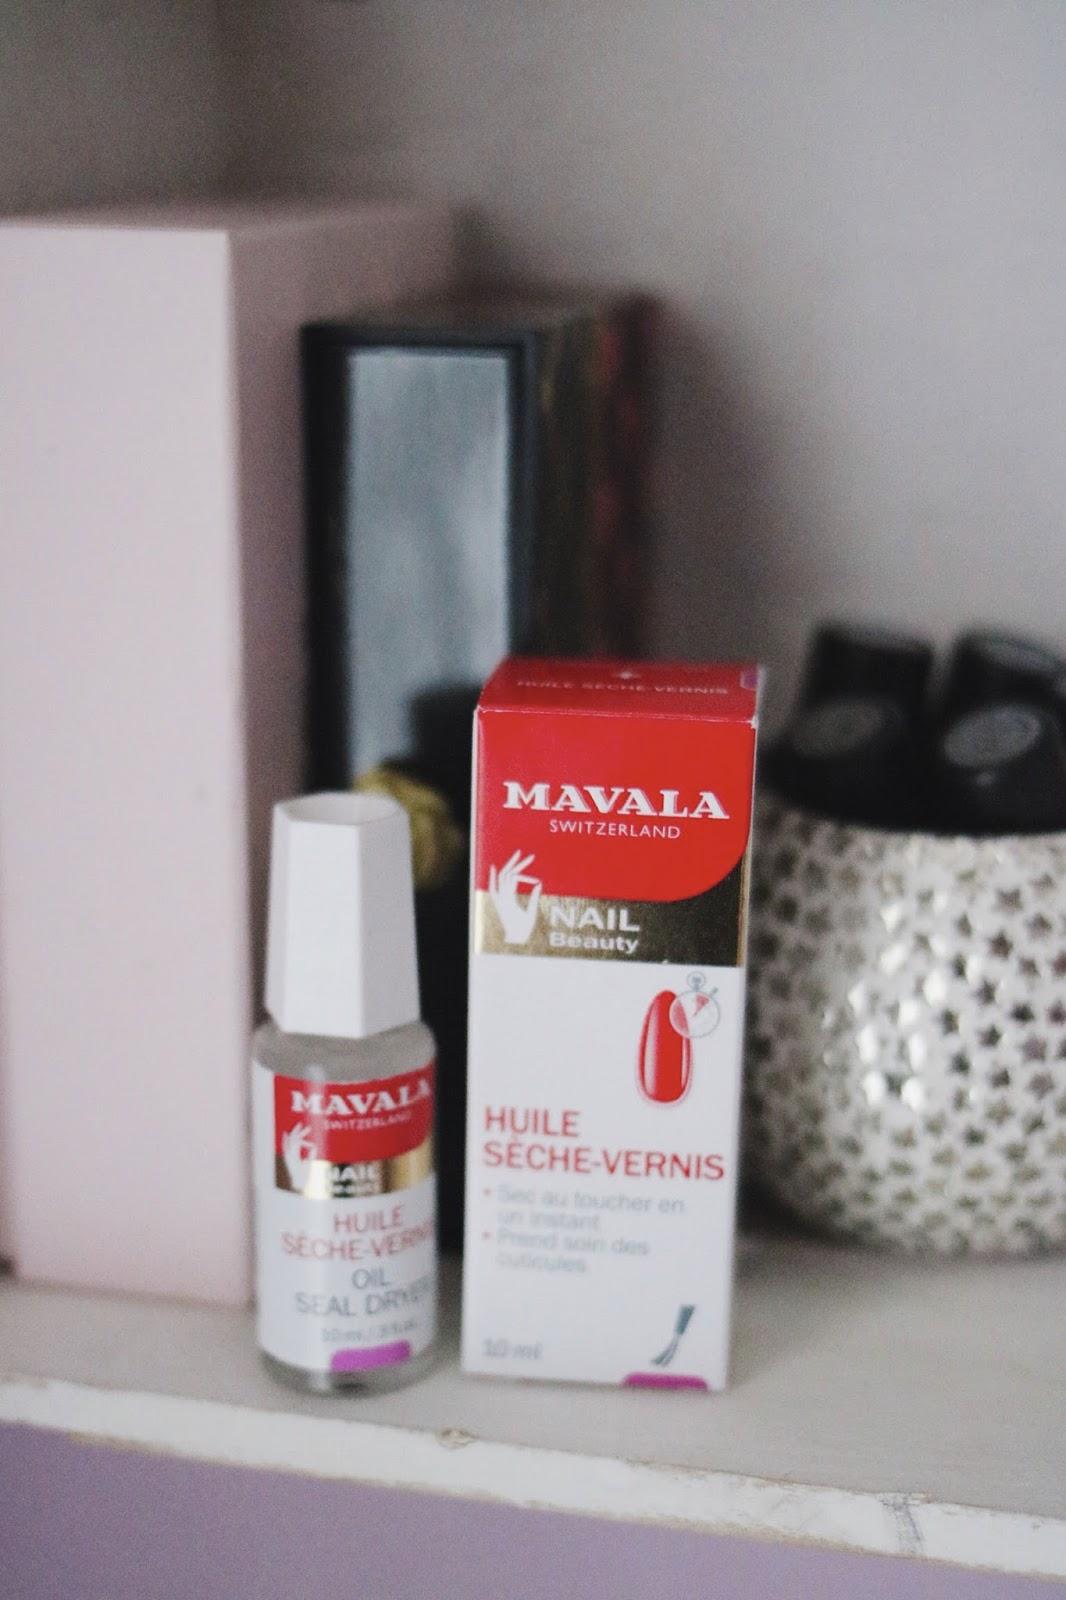 rosemademoiselle-rose-mademoiselle-mavala-huile-sèche-vernis-avis-revue-blog-beaiuté-indispensable-vernis-manucure